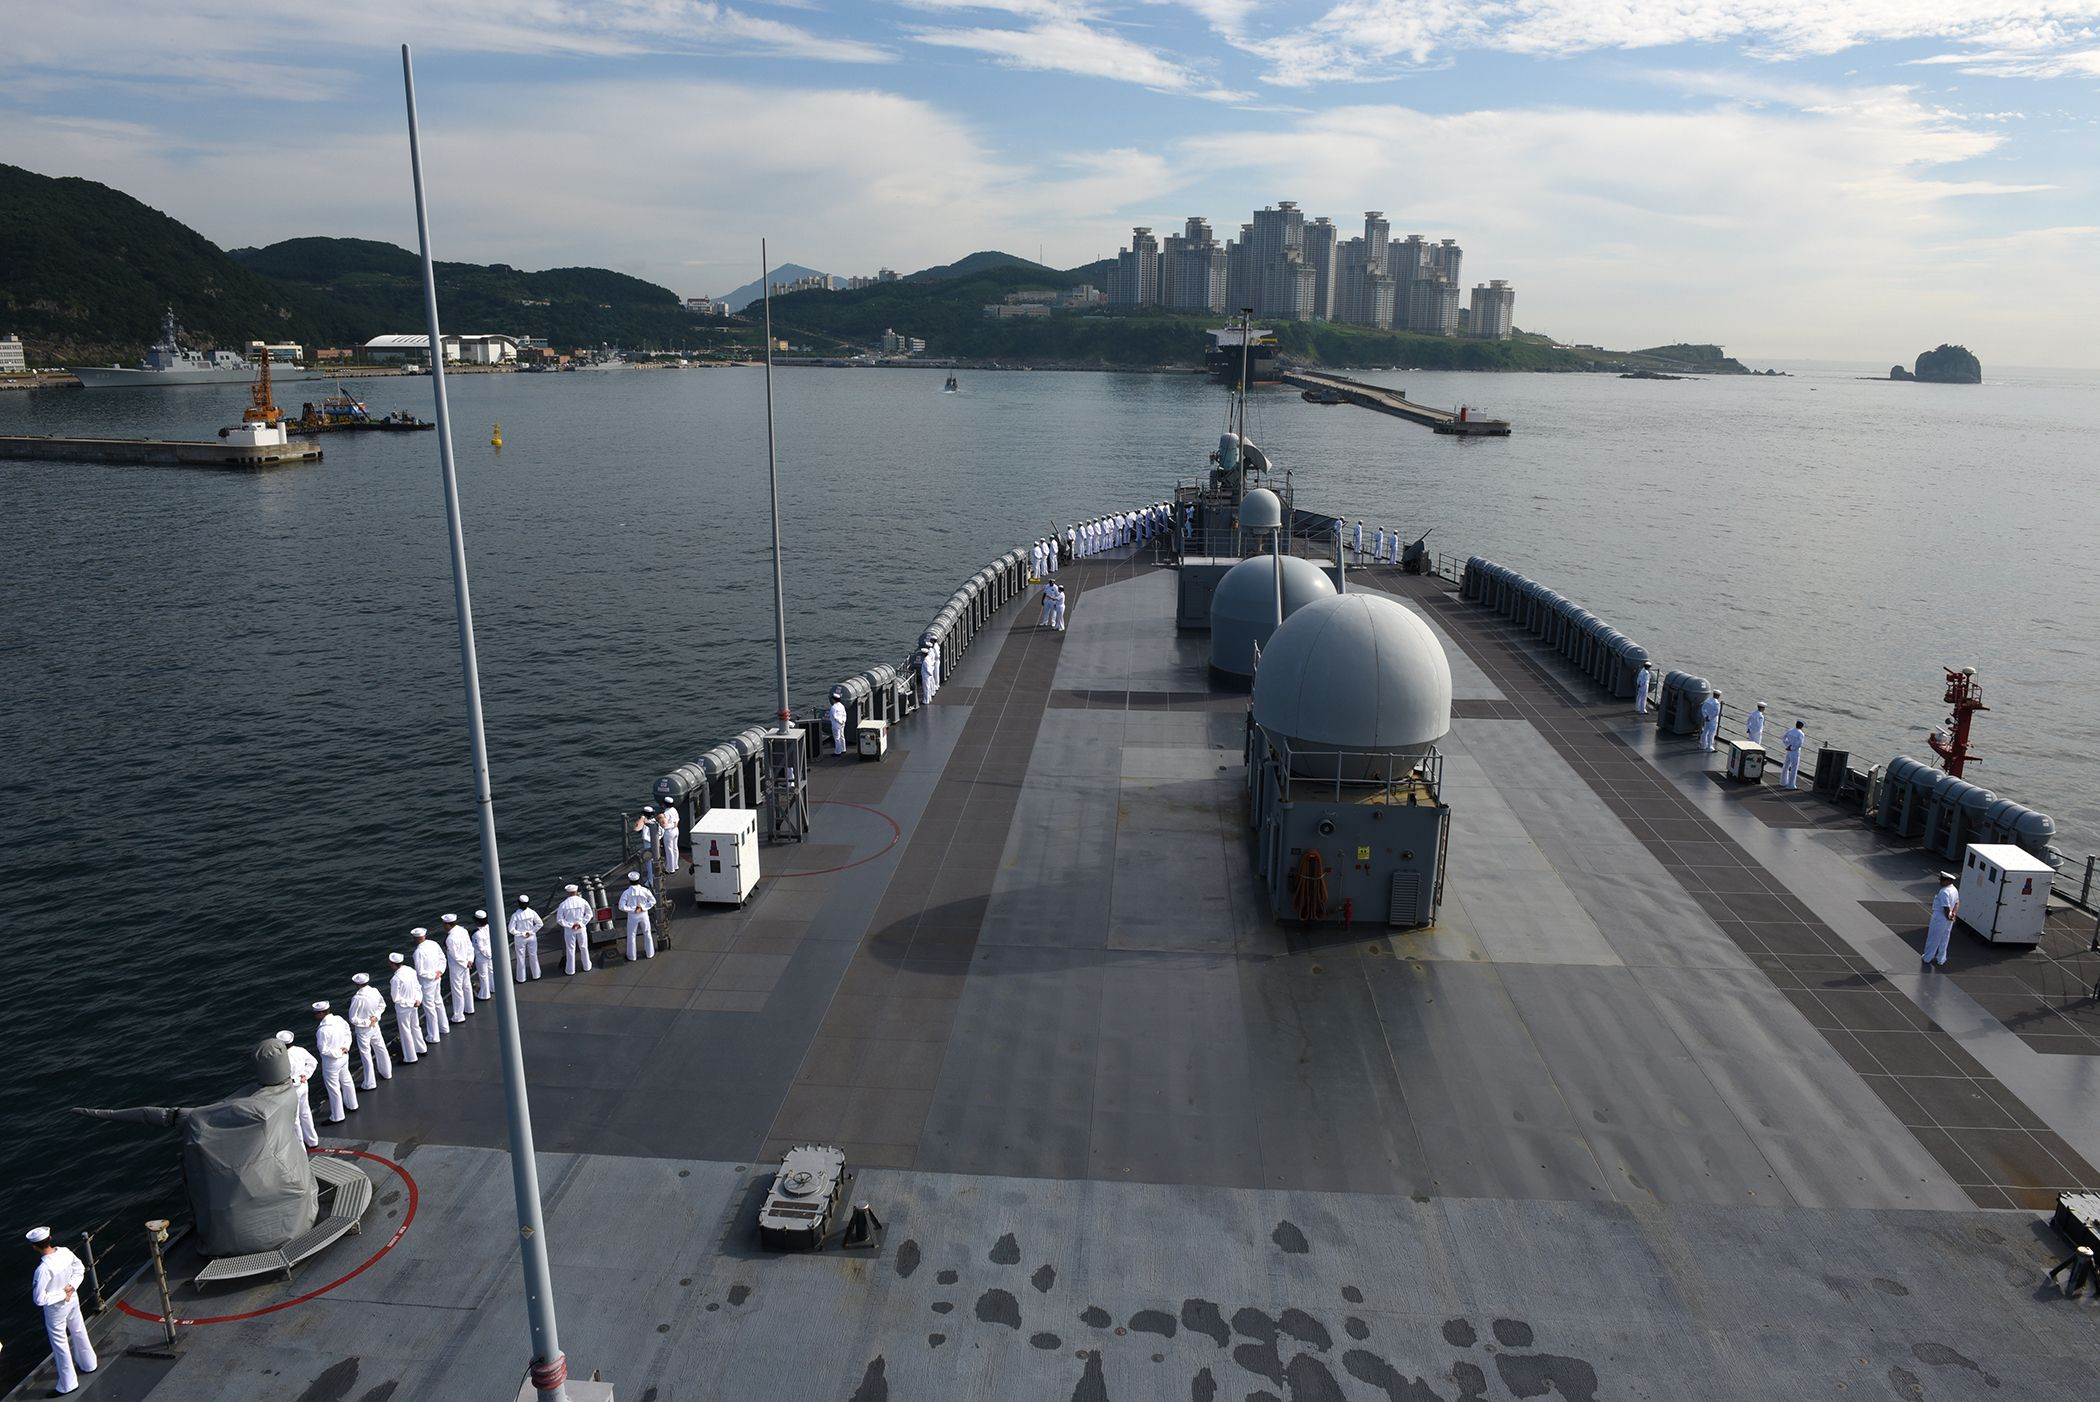 USS Blue Ridge, Navy, South Korea, Busan